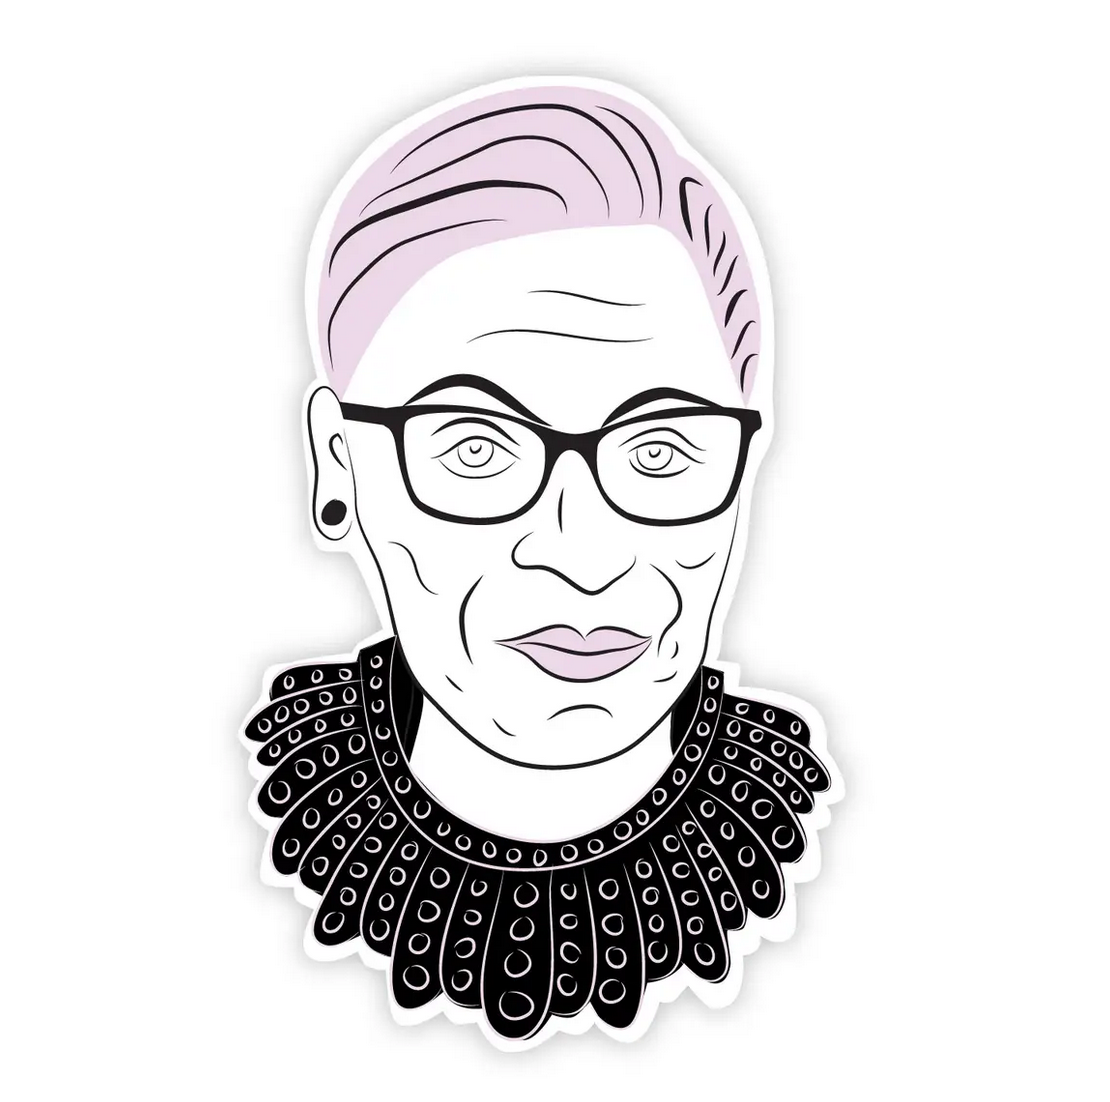 Boss Dotty Ruth Bader Ginsburg Sticker